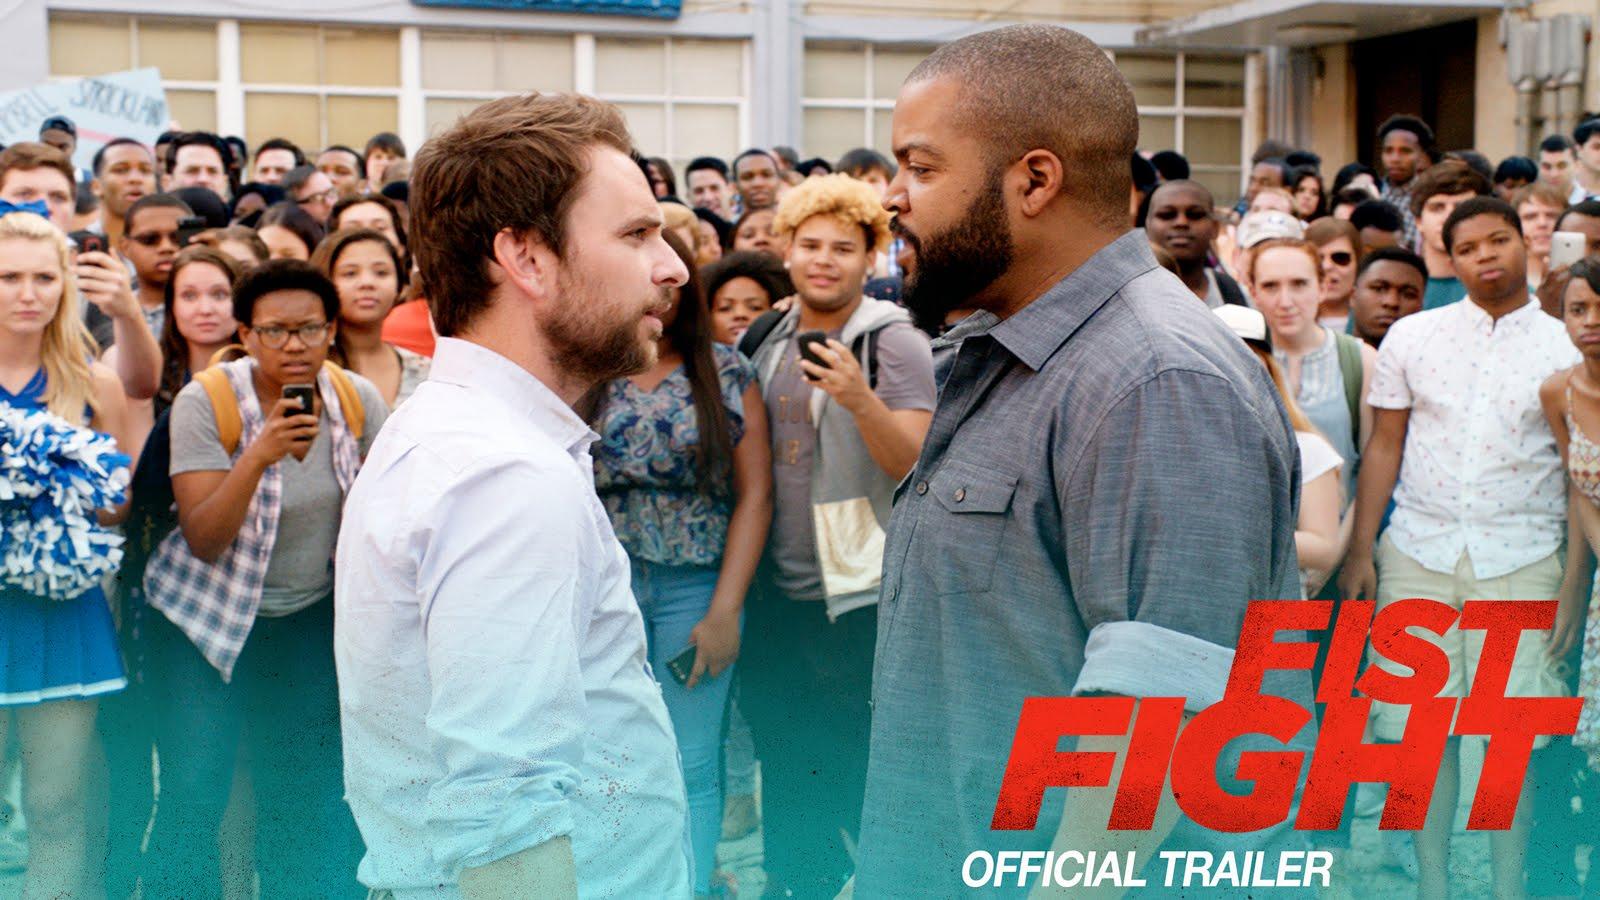 Fist Fight (2017) video/trailer